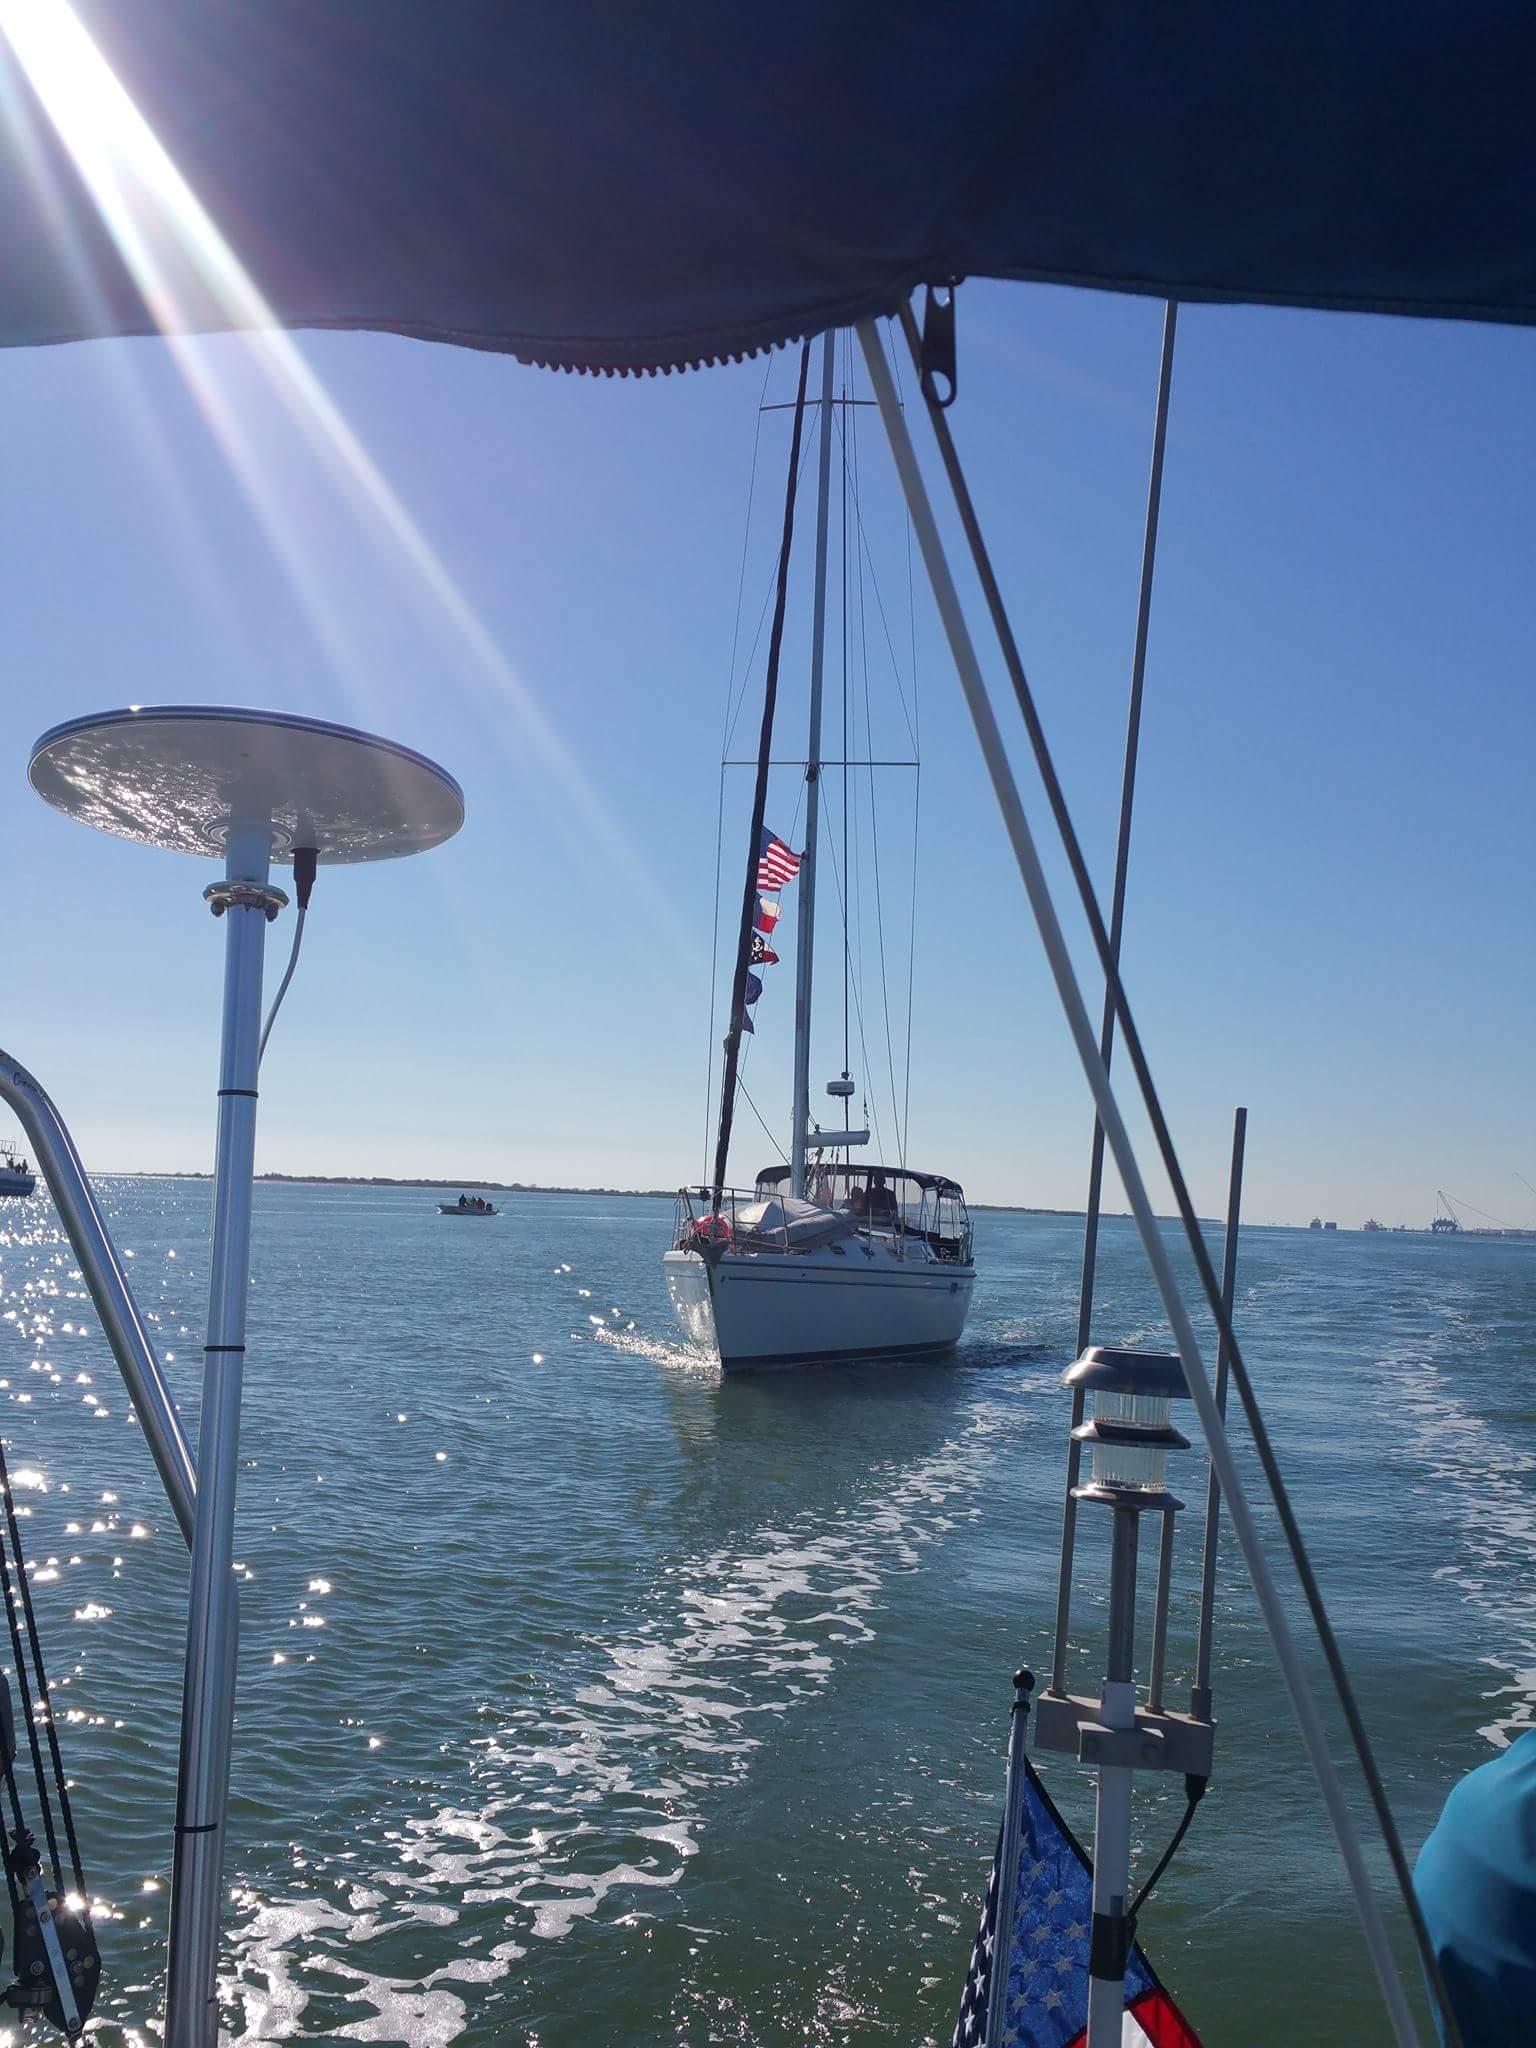 Bum boat trailing behind Waimanu